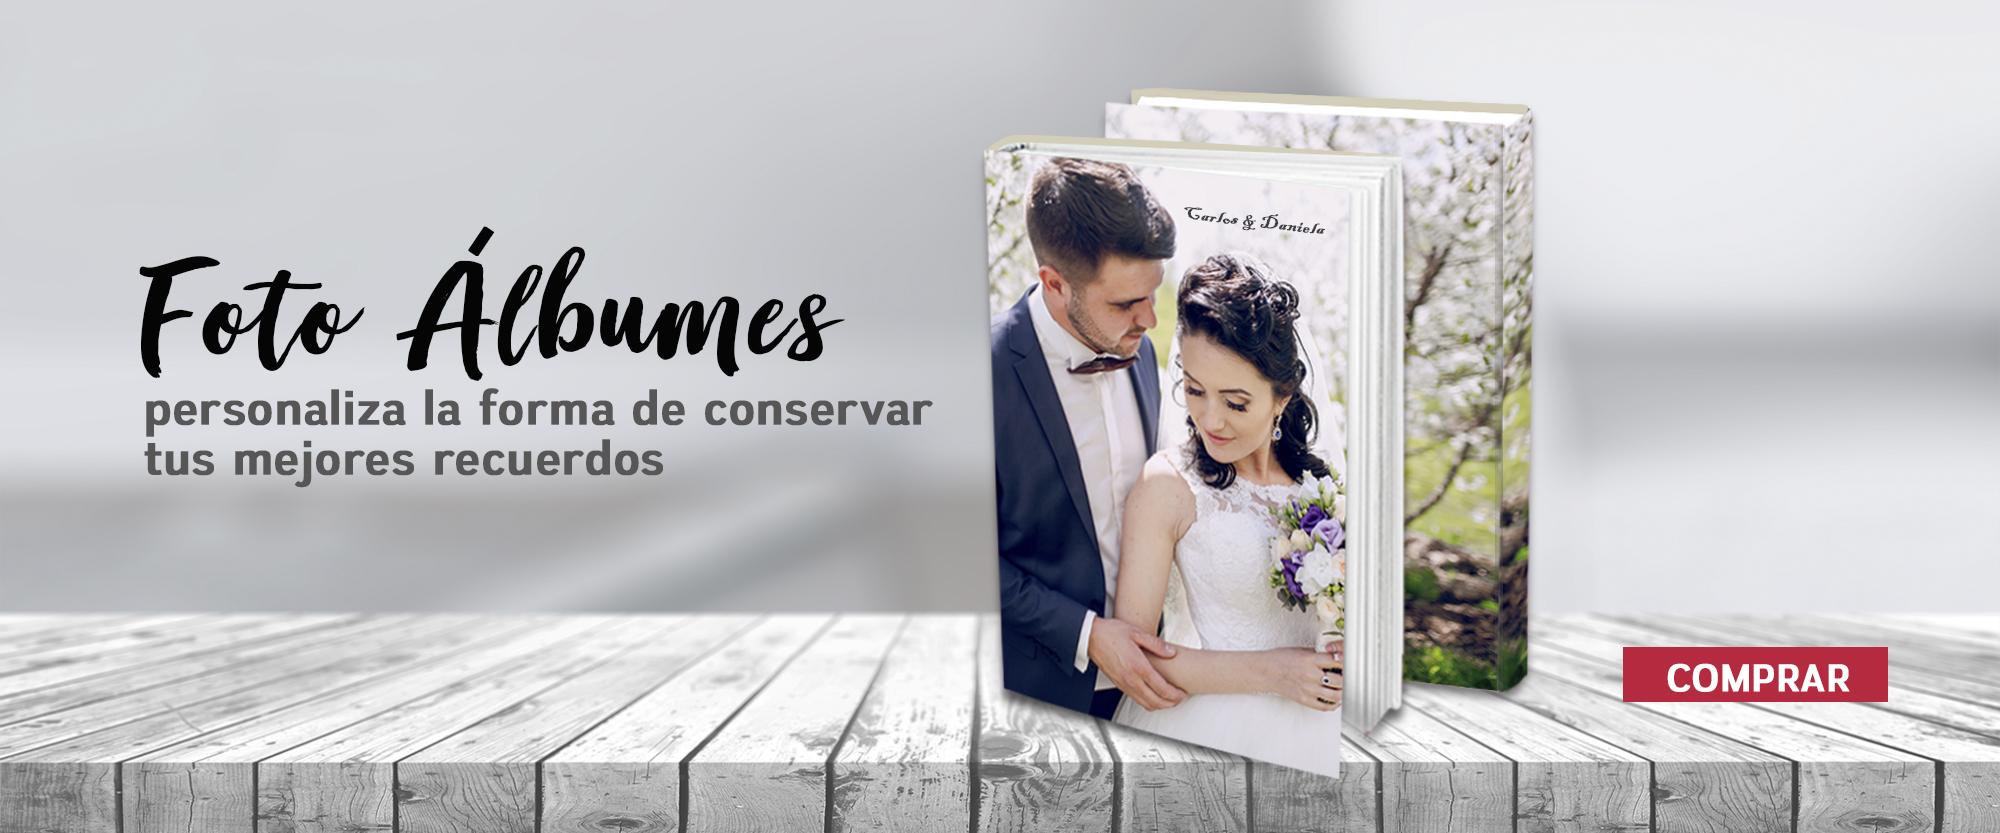 banner-foto-libros-pagina